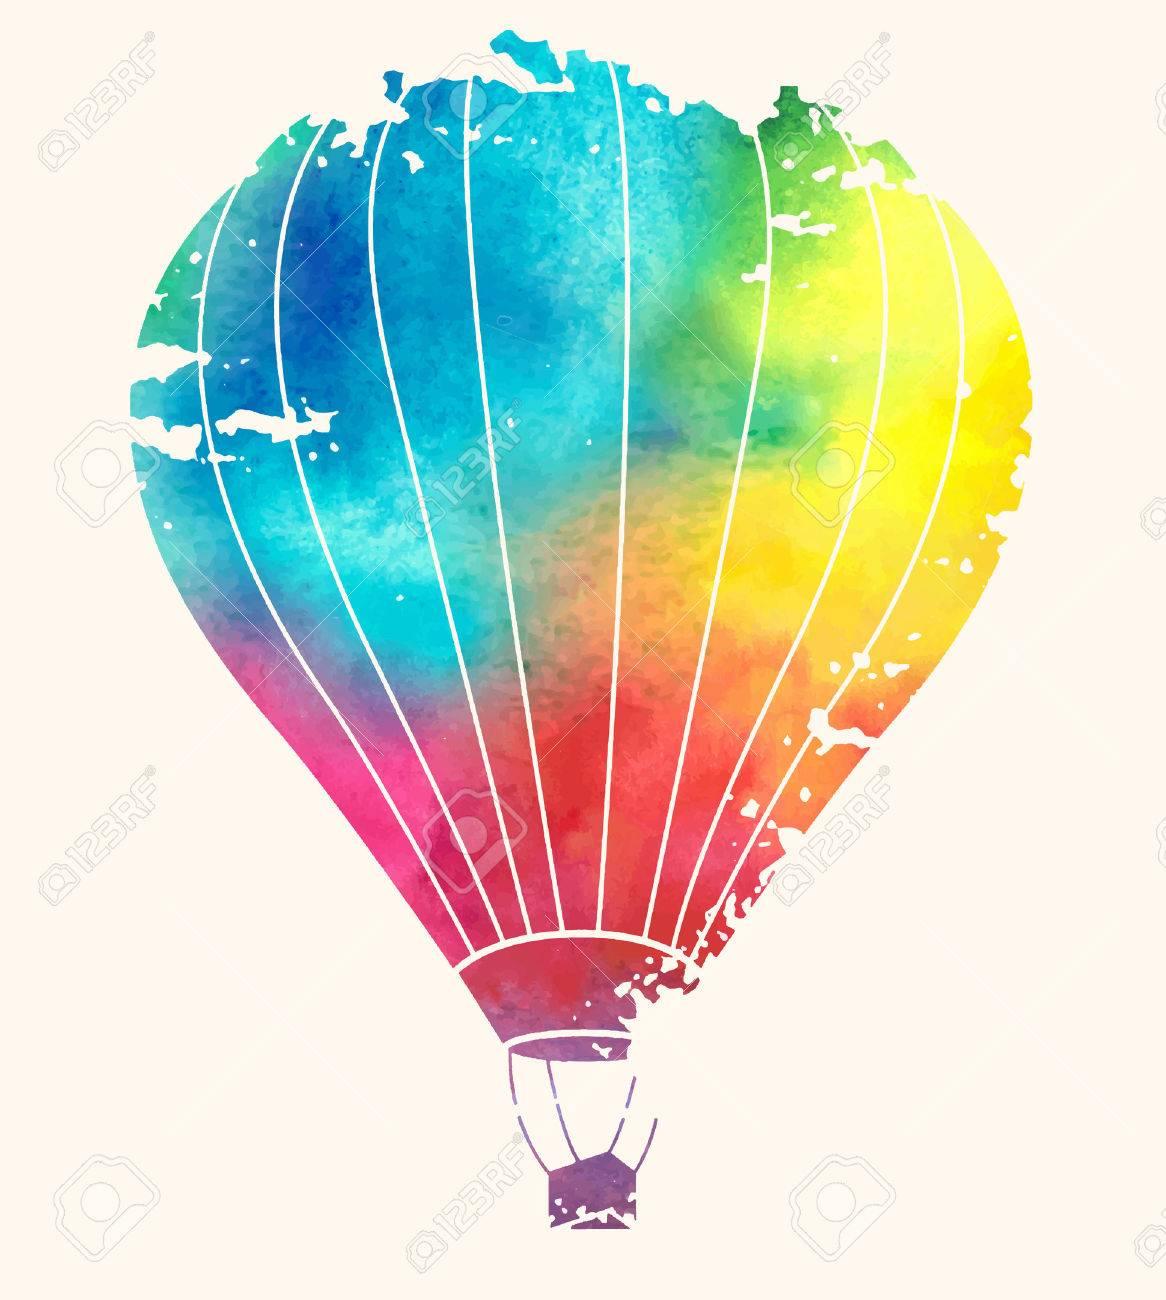 1166x1300 Watercolor Vintage Hot Air Balloon Royalty Free Cliparts, Vectors